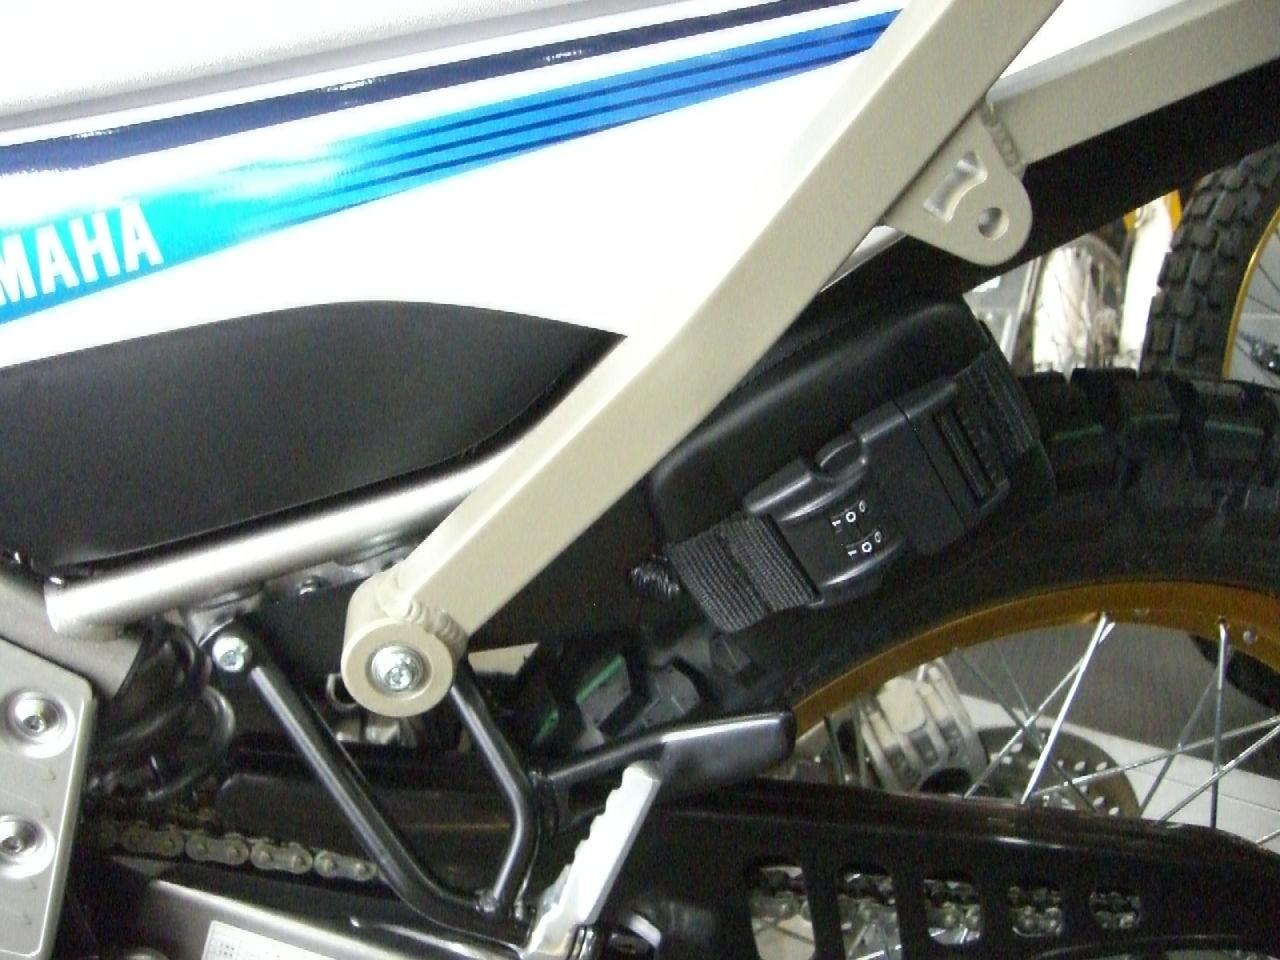 http://www.ysp-kawaguchi.com/blog/images/resize650.jpg